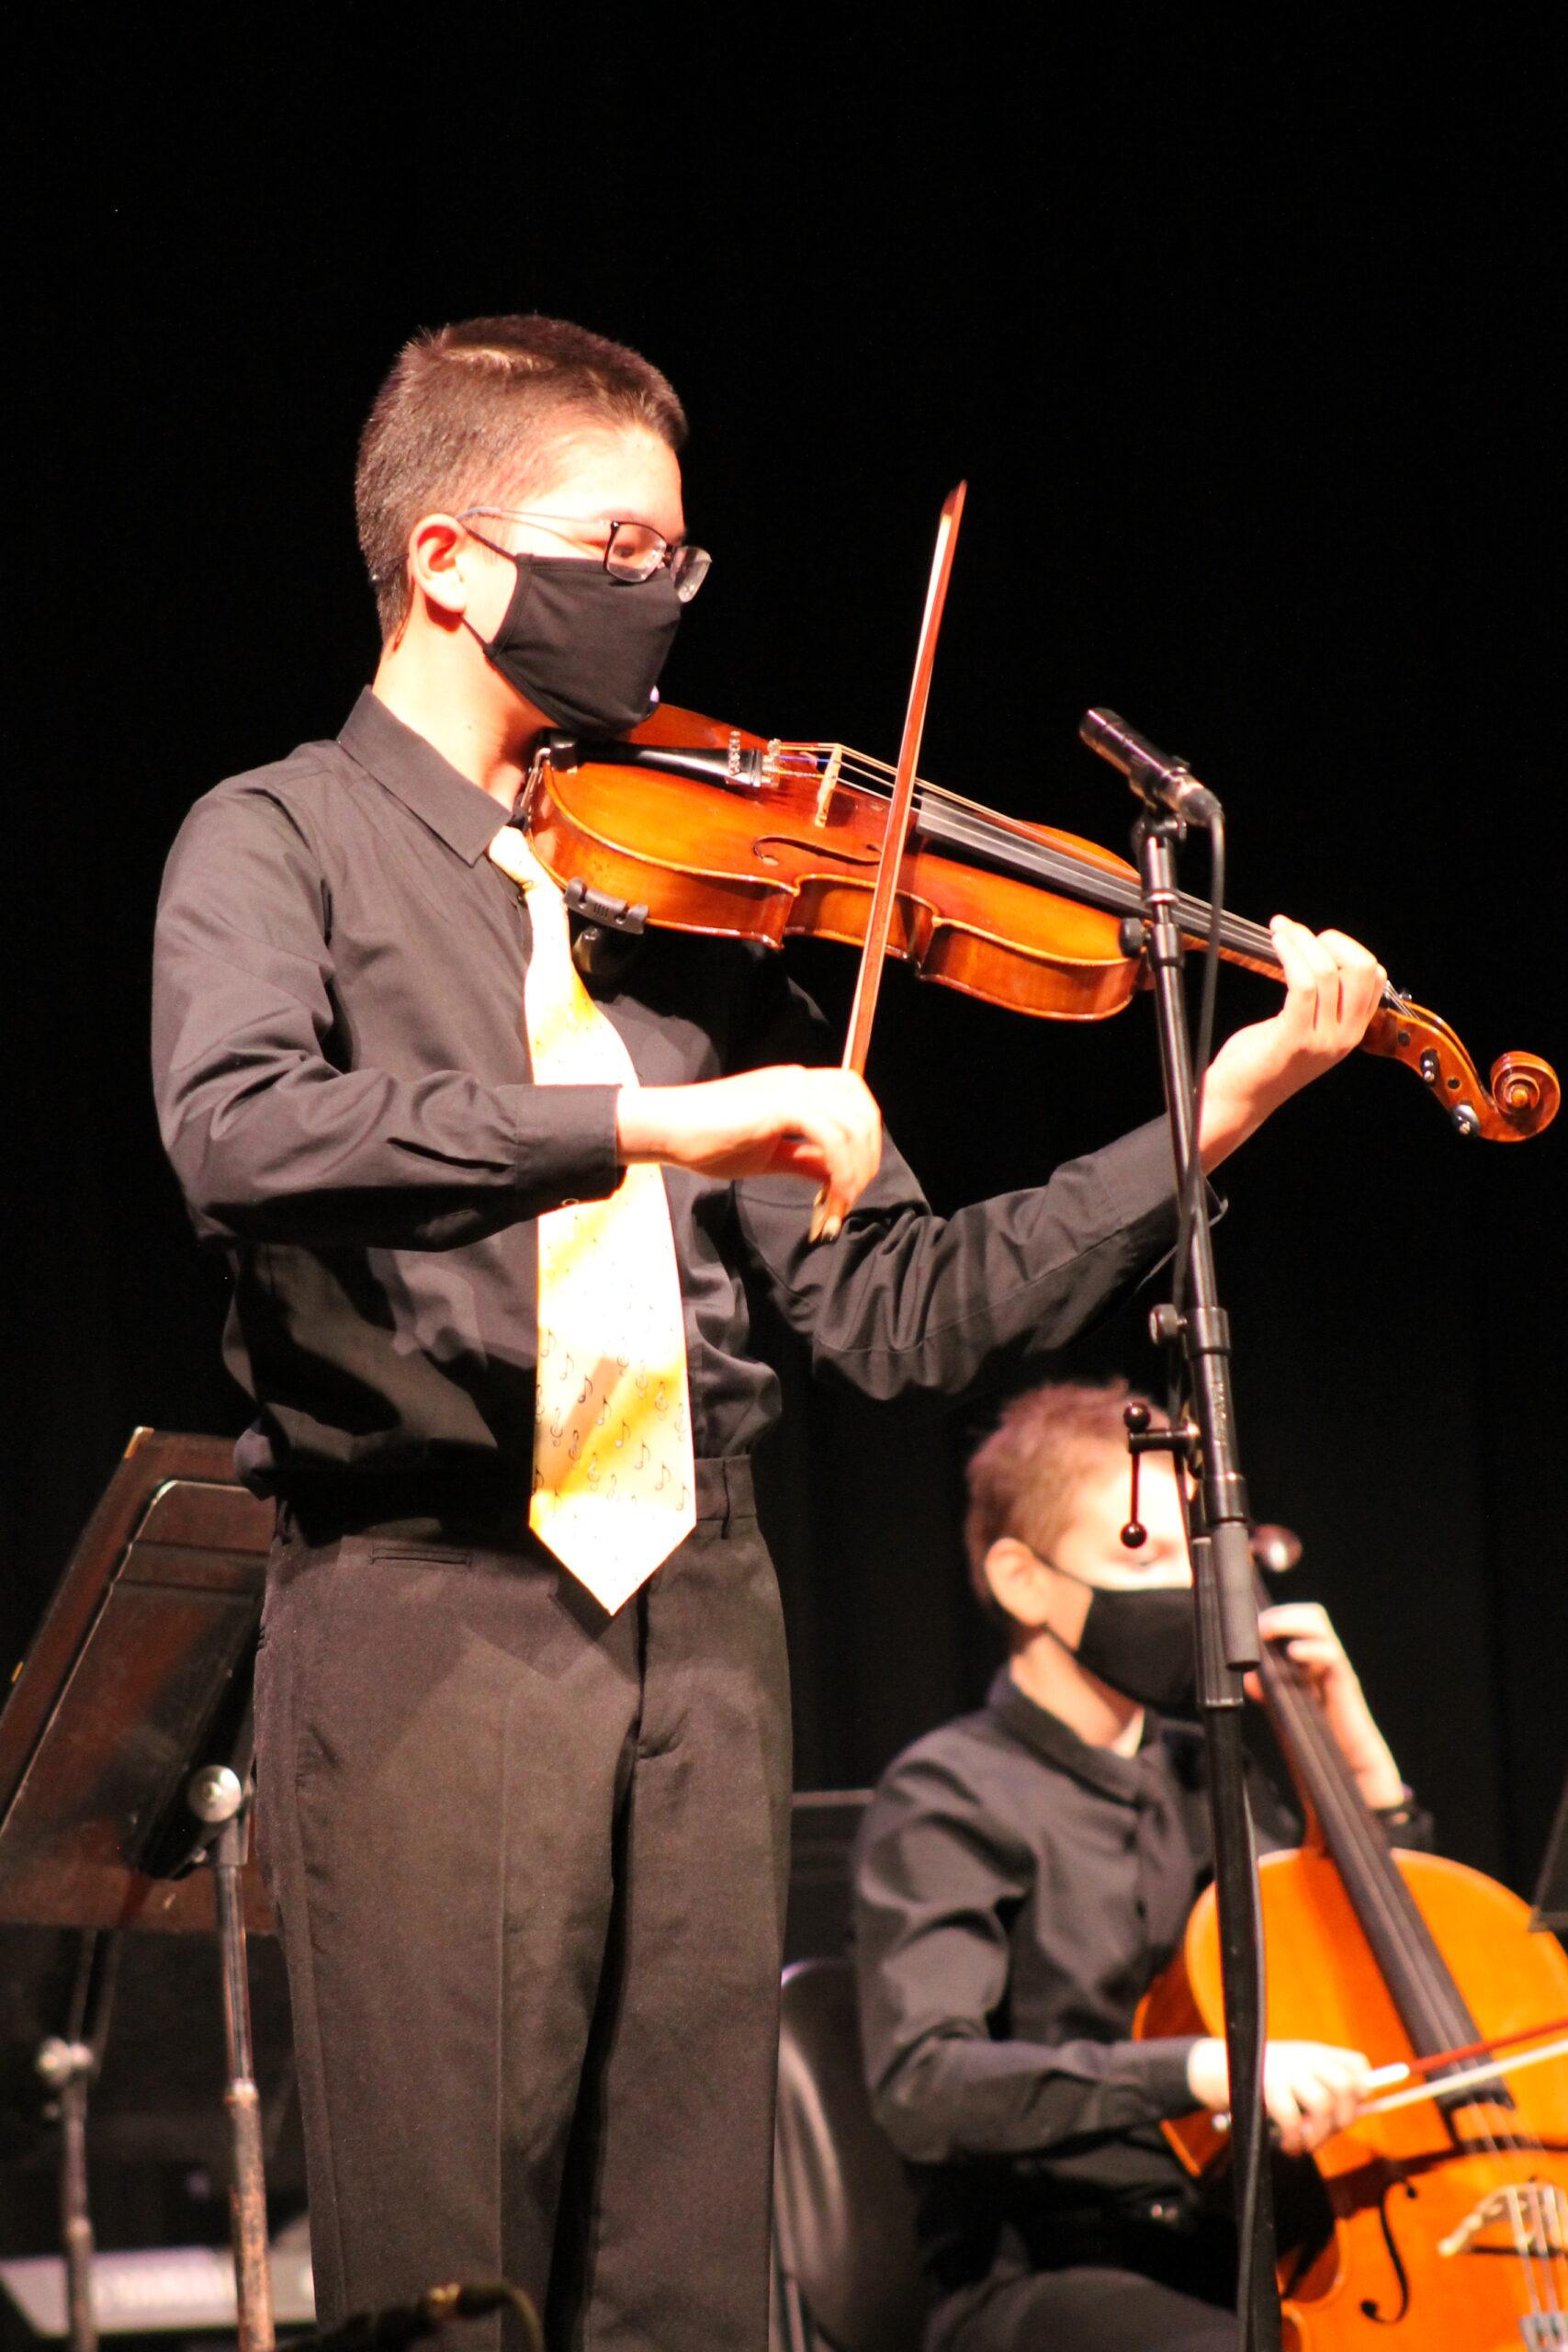 Soloist on viola during LJYO concert